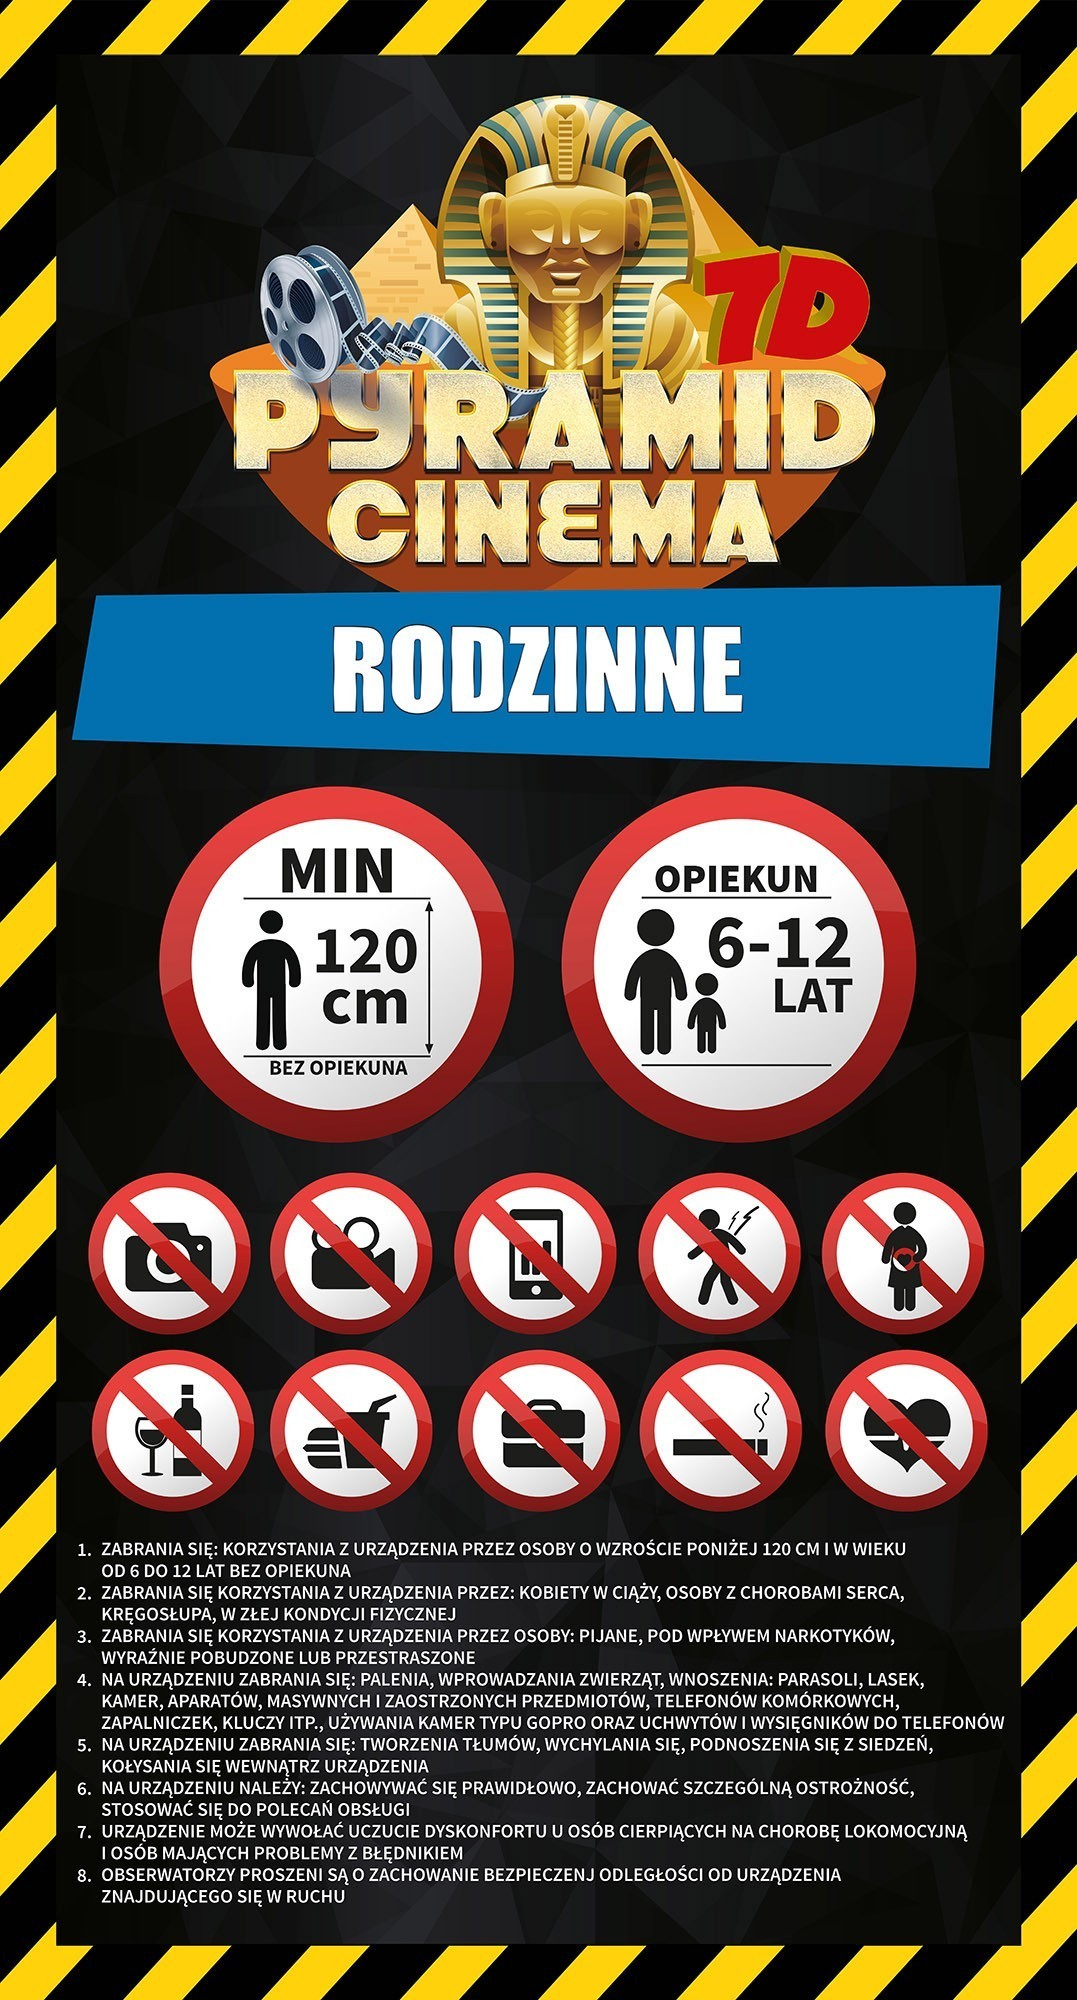 rodzinne-PYRAMIDA_illusion_cinema7d